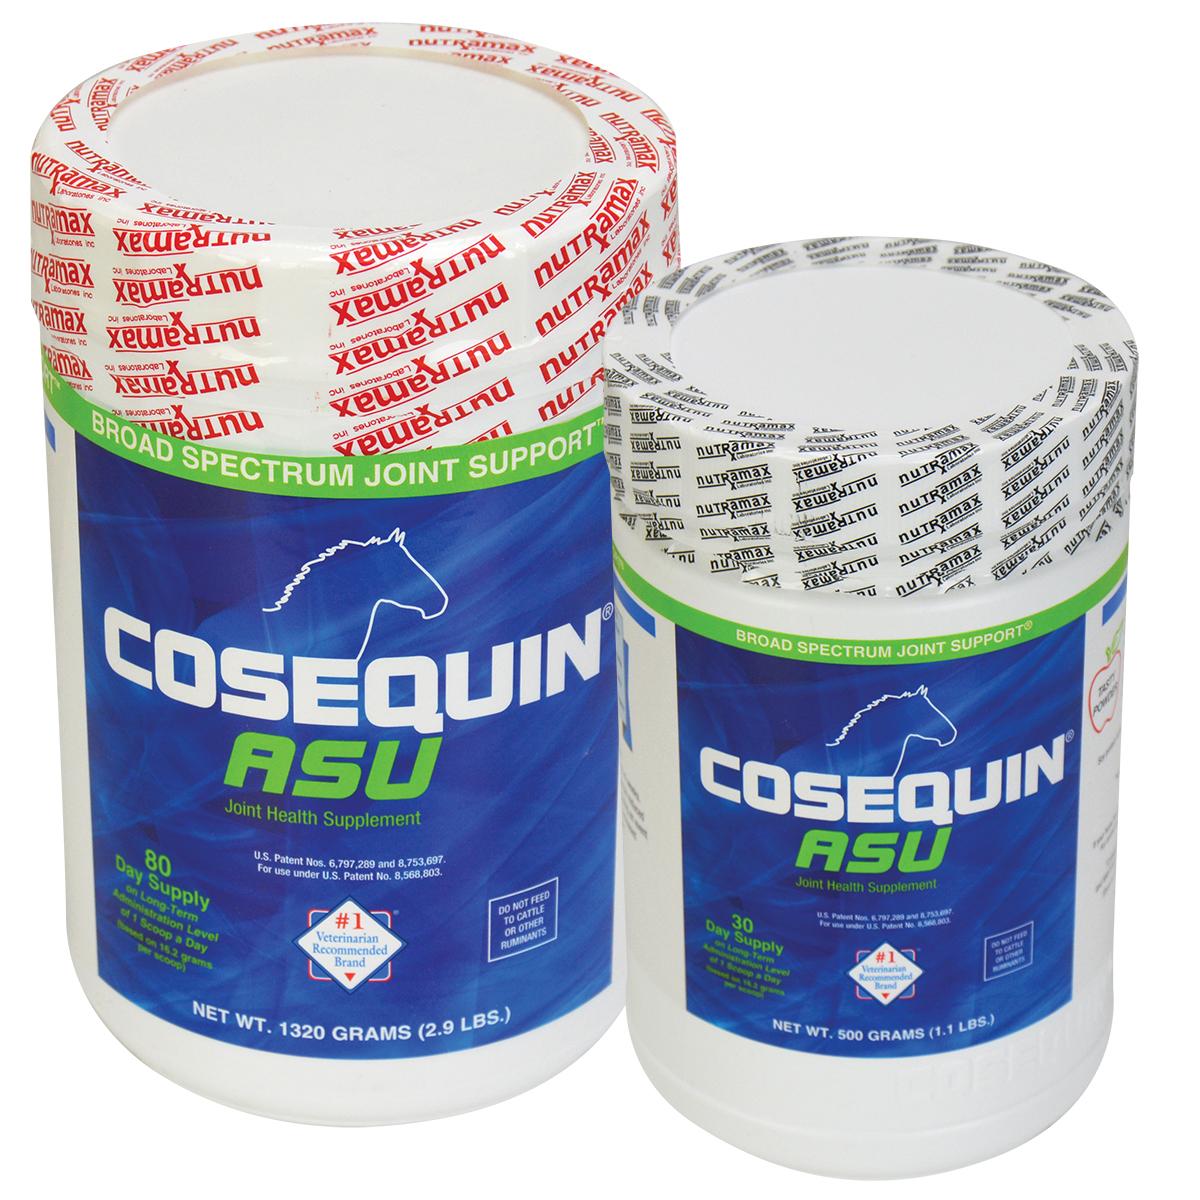 Cosequin ASU